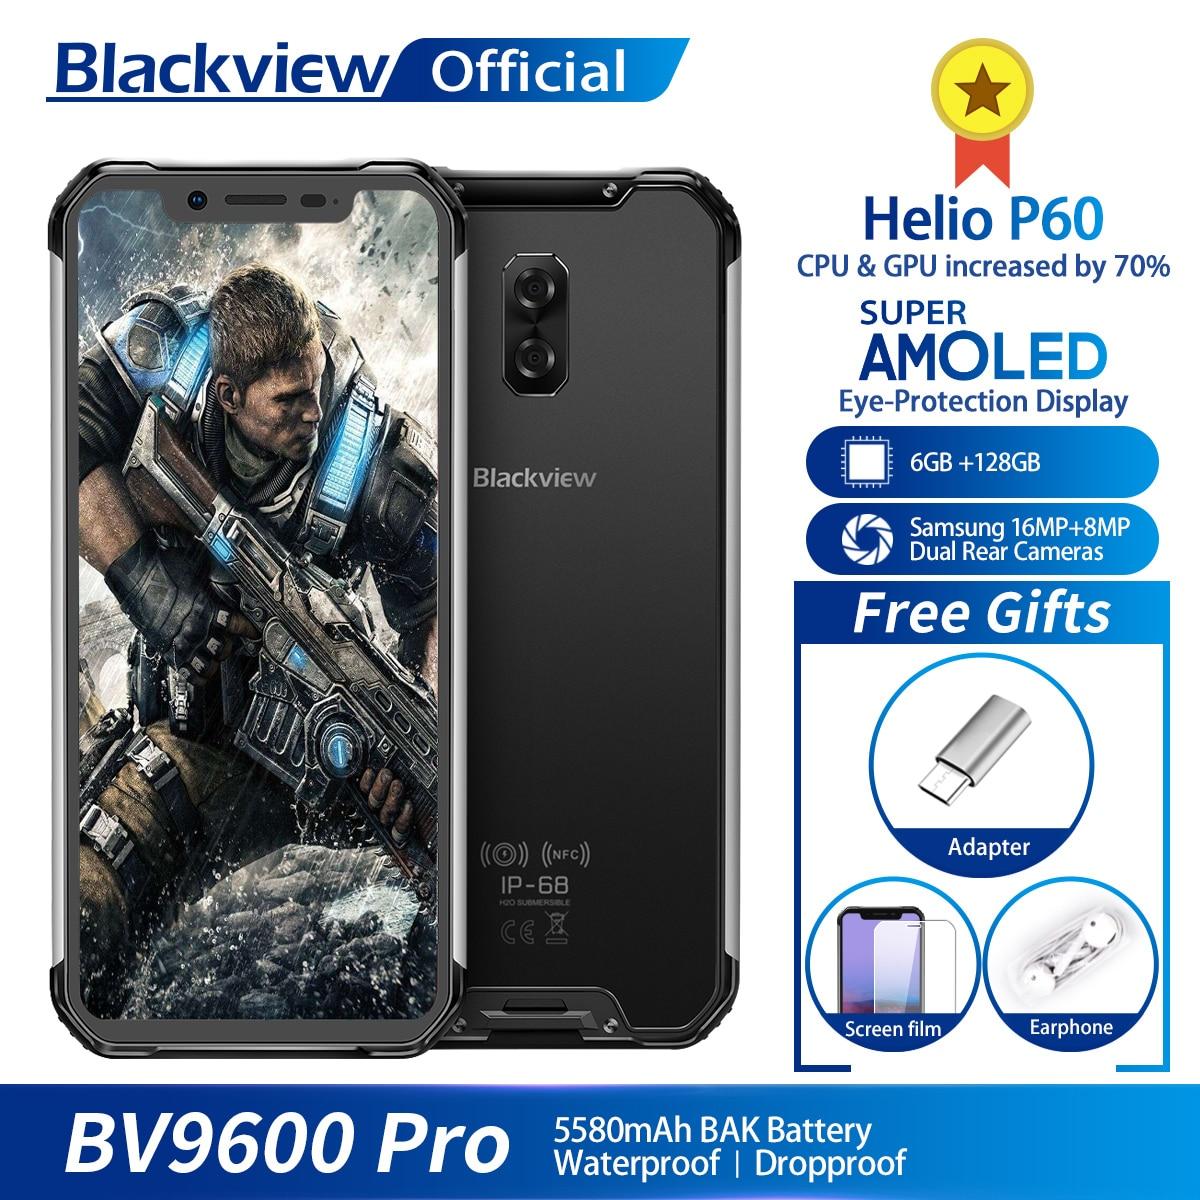 Blackview BV9600 Pro Helio P60 Android 8.1 6GB+128GB Mobile Phone IP68 Waterproof 6.21